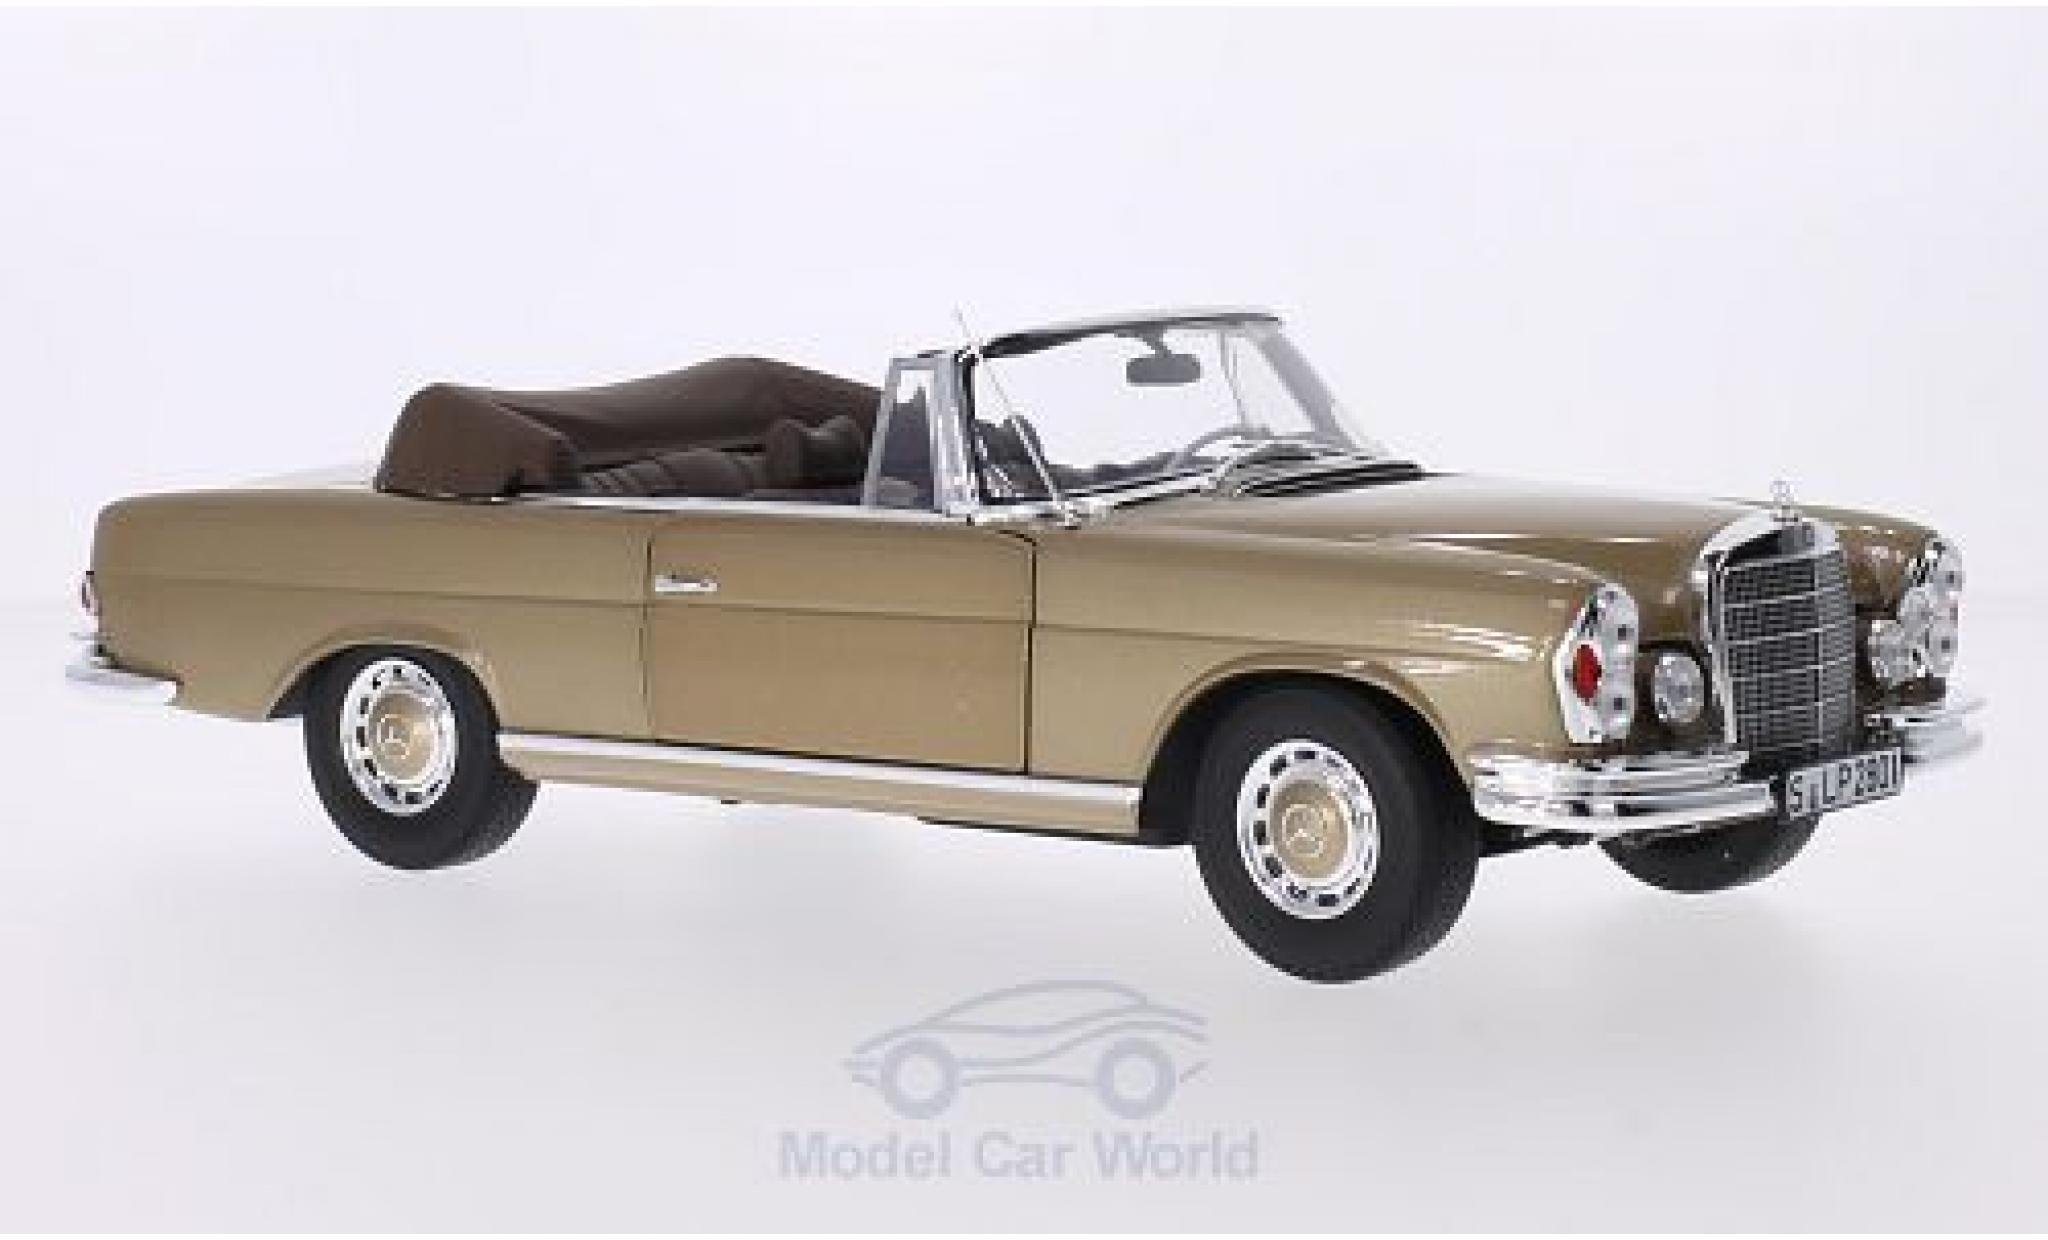 Mercedes 280 1/18 I Norev SE (W111) Cabriolet métallisé beige Softtop liegt bei